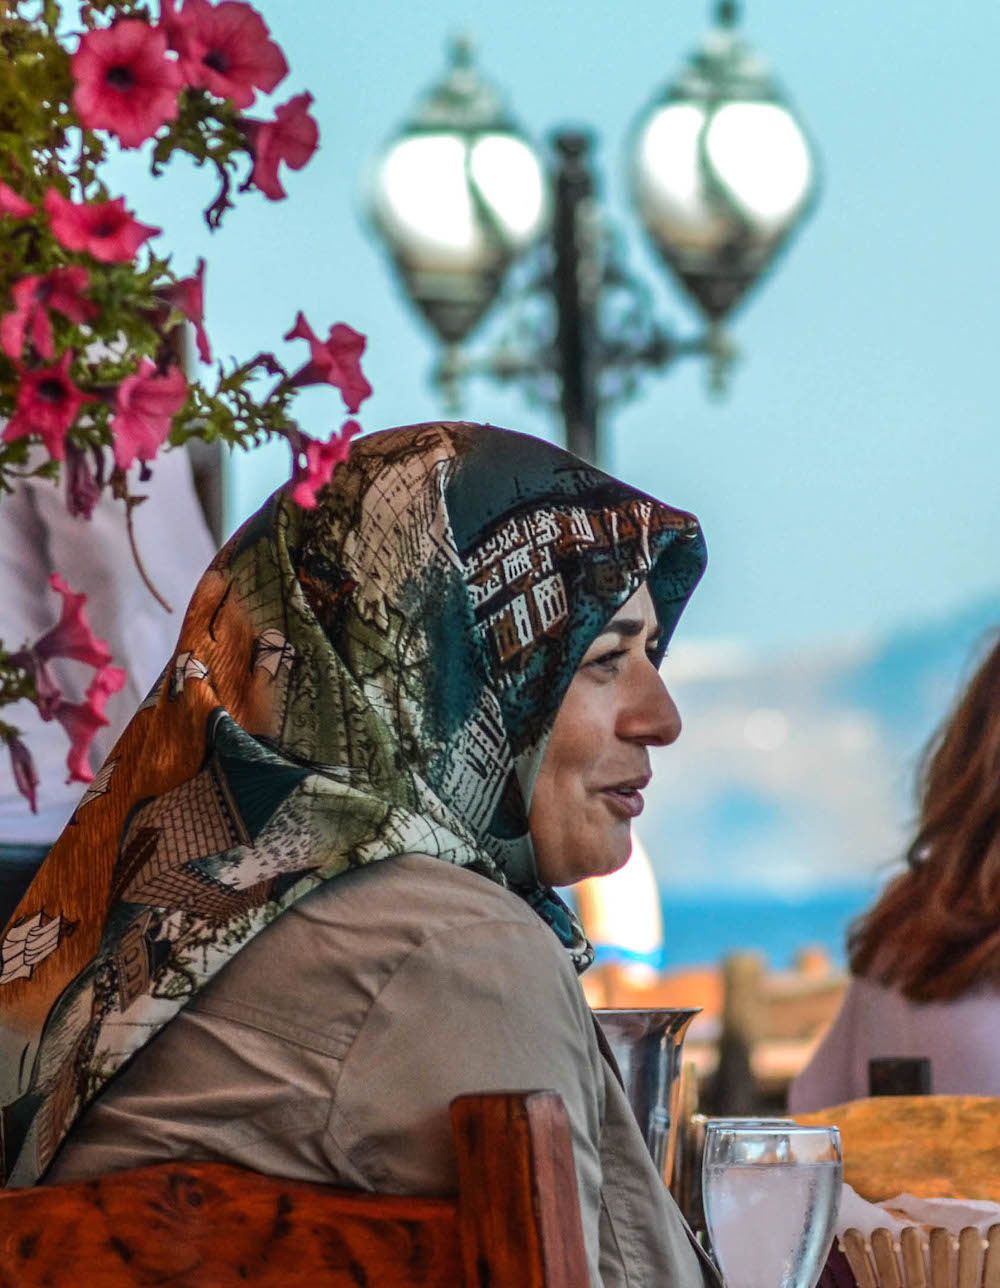 buyukada-island-istanbul-turkey-scarf-buddha-drinks-fanta